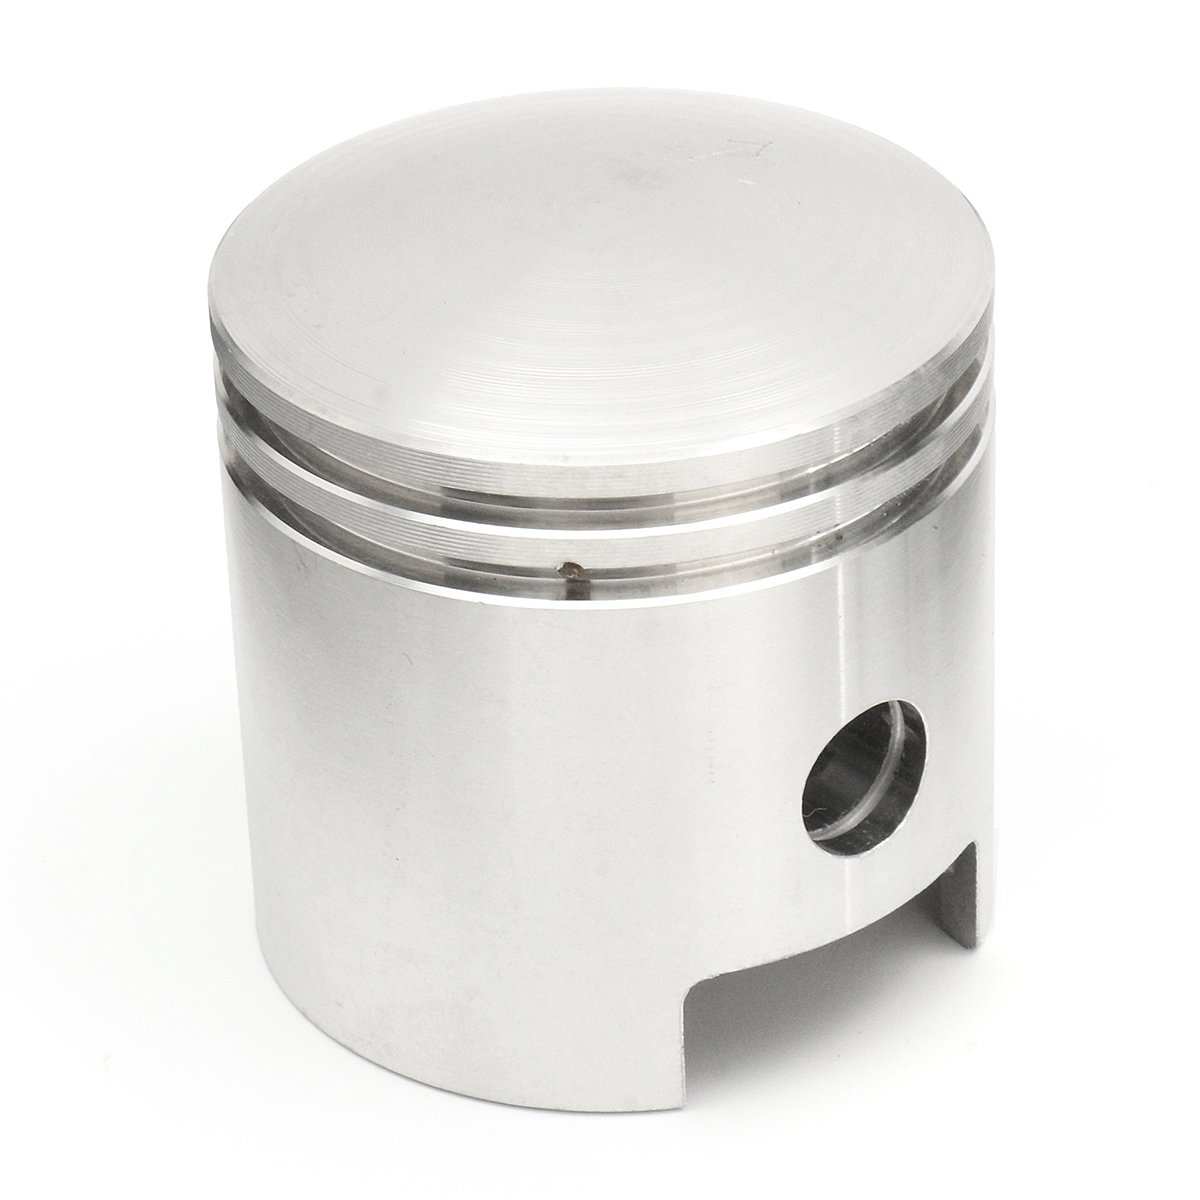 JenNiFer Universal Piston Cylinder Gasket Rings Engine Kit For 2 Stroke 80cc Engine Motor